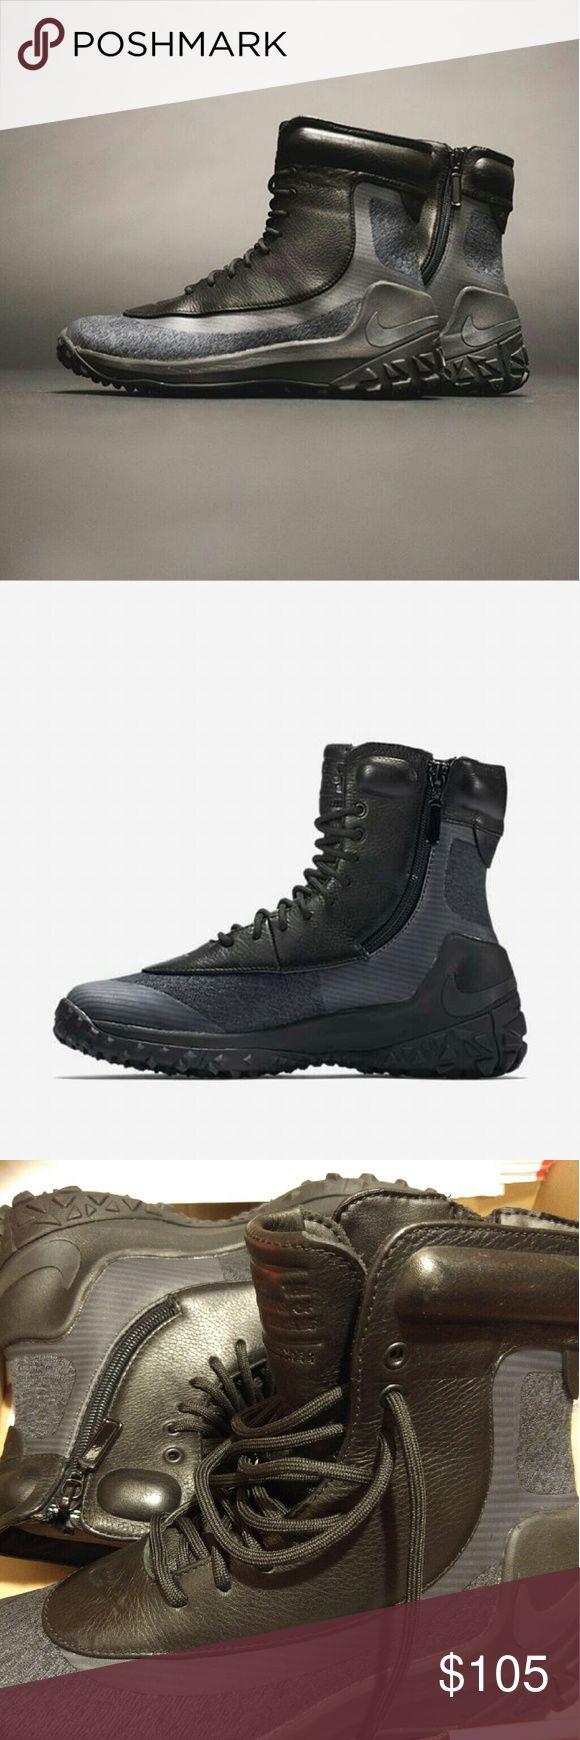 Women's Nike Zoom Kynsi Jacquard Waterproof Boots New Women's Nike Zoom Kynsi Jacquard Waterproof Boots Nike Shoes Winter & Rain Boots